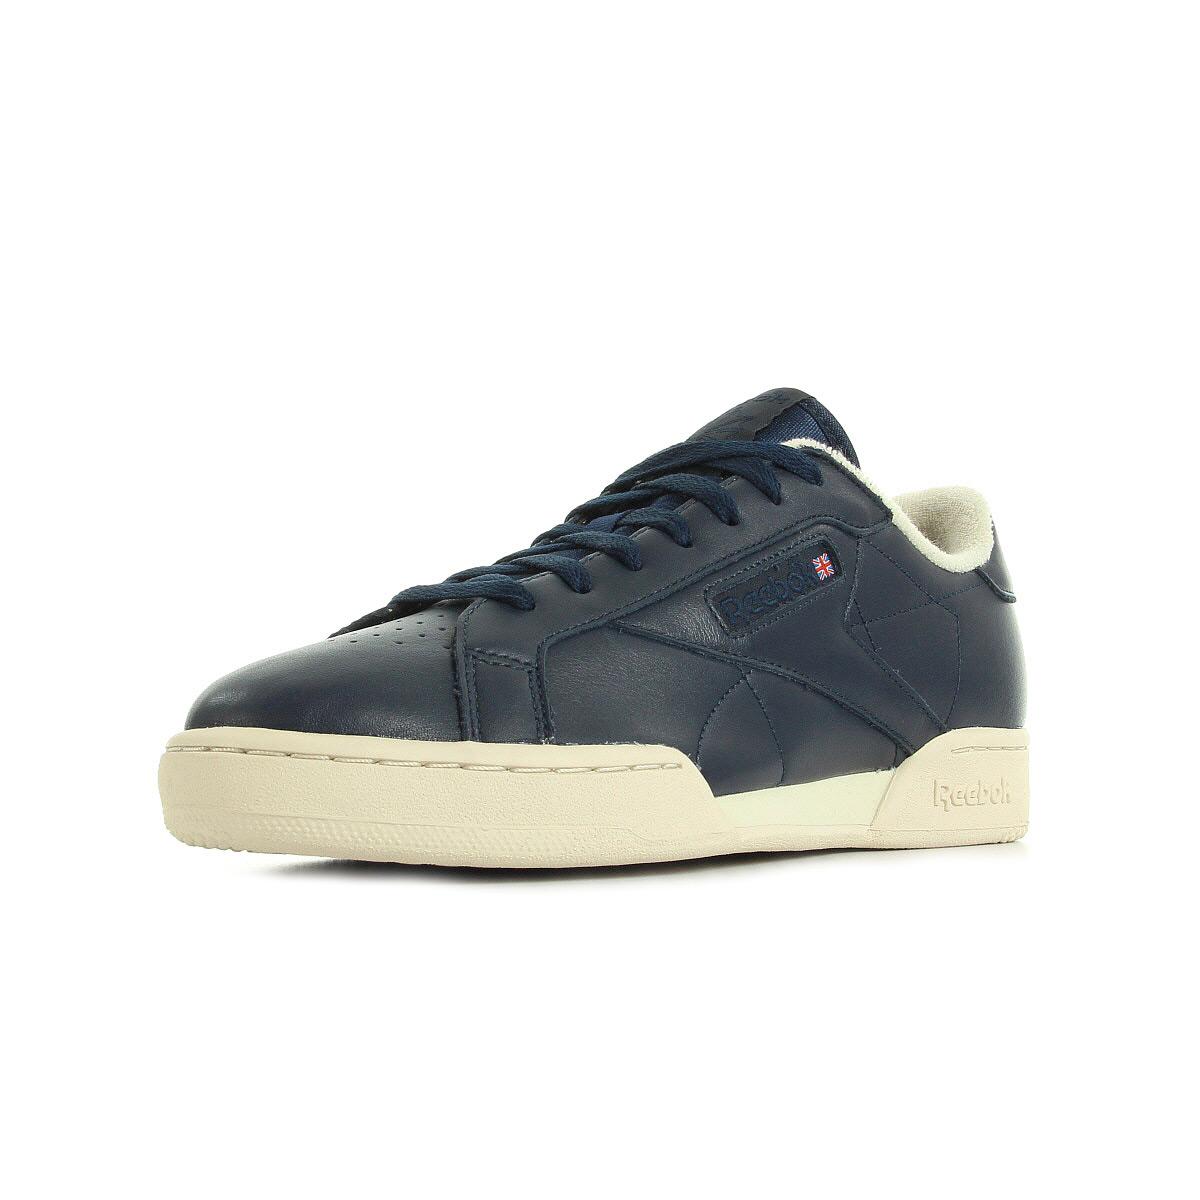 Reebok Sport Npc UK autre - Chaussures Baskets basses Homme